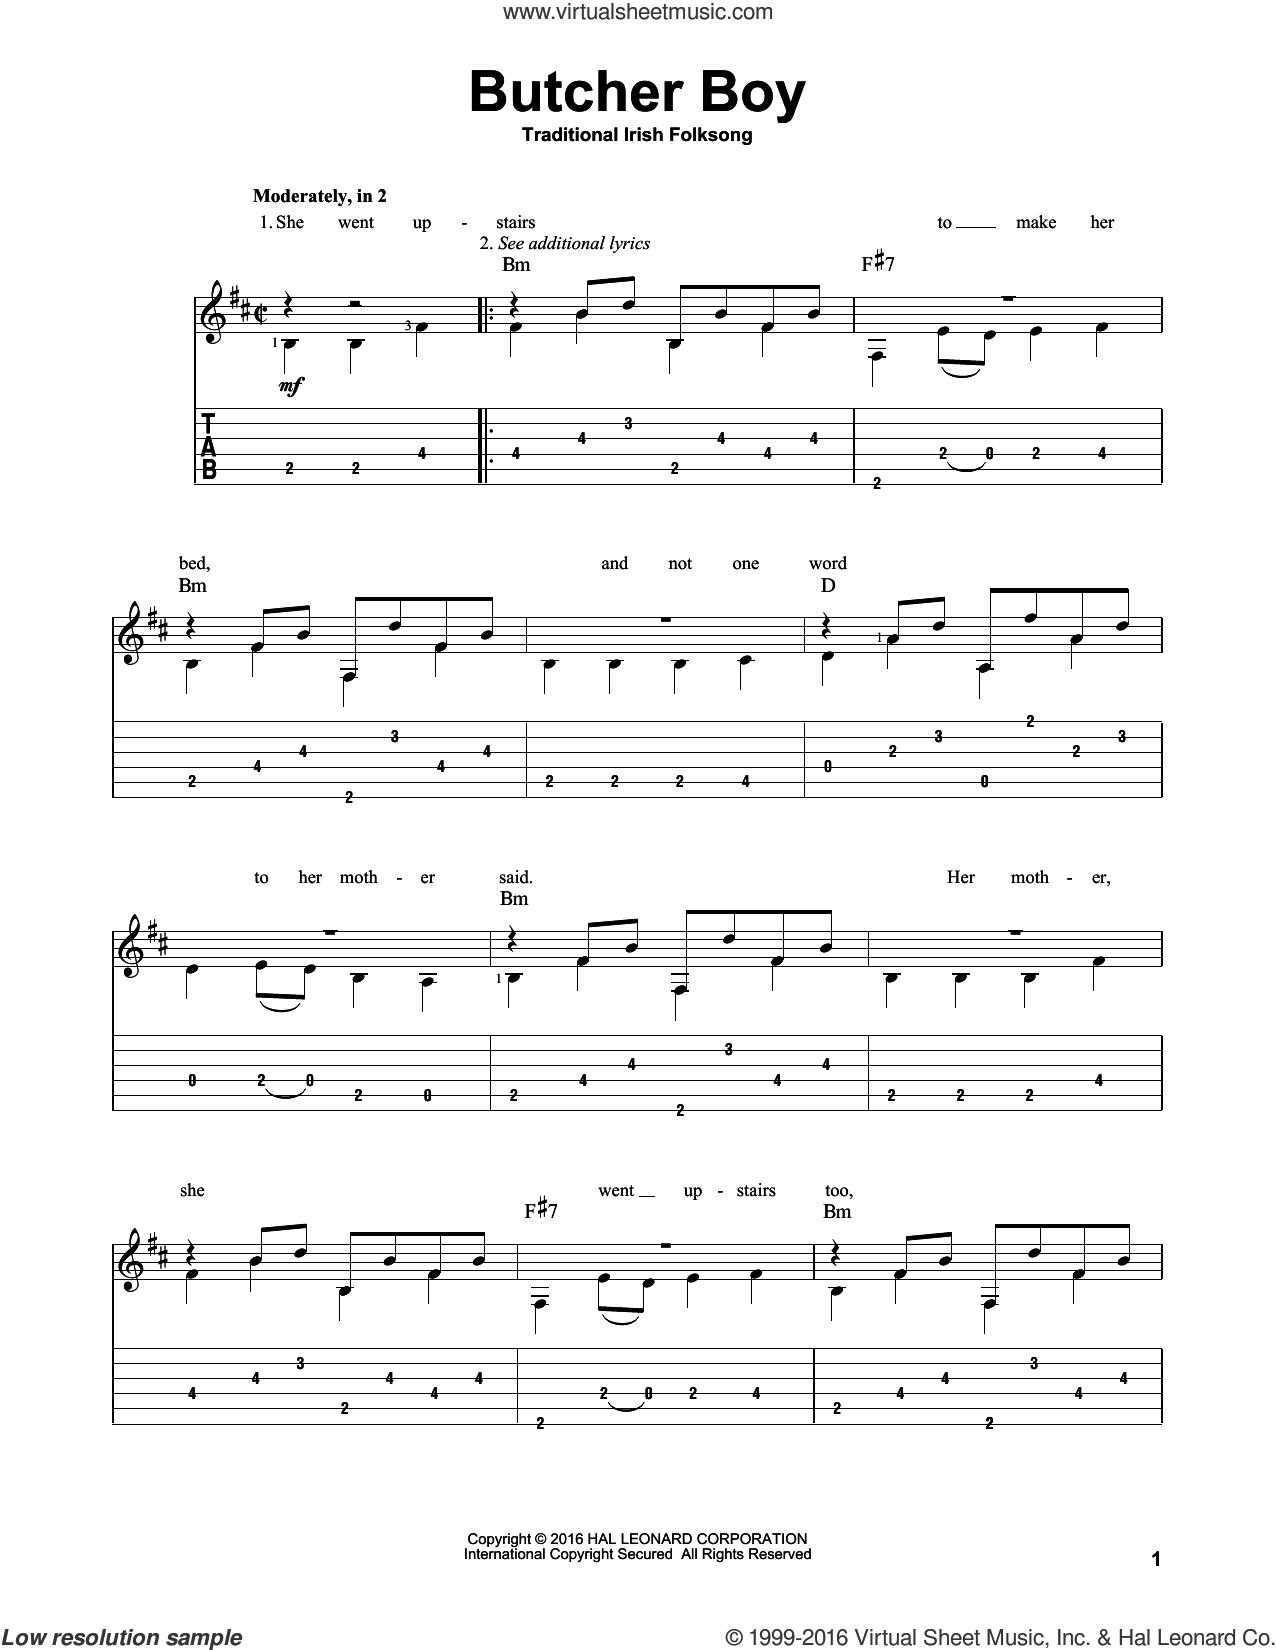 Butcher Boy sheet music for guitar solo, intermediate skill level